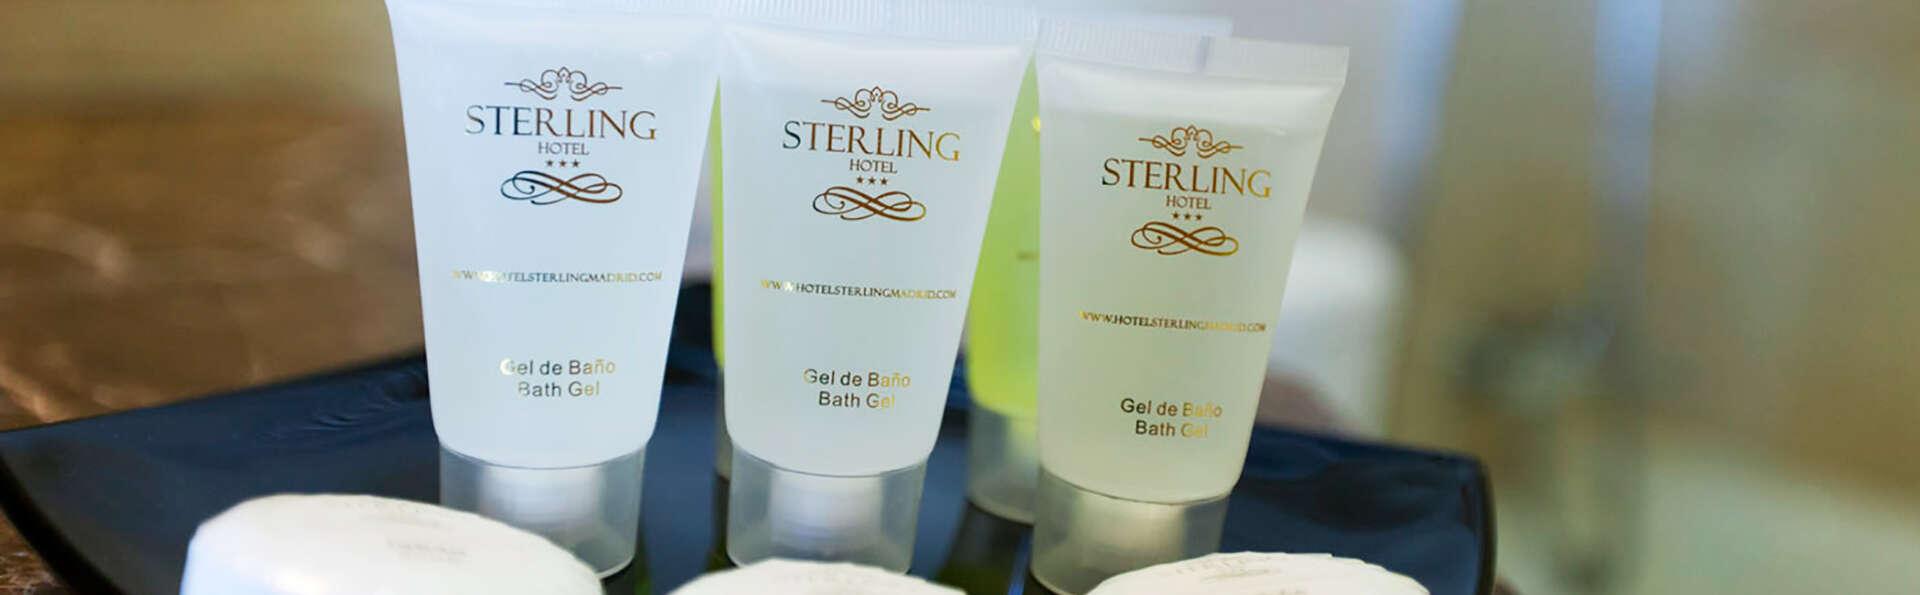 Hotel Sterling - edit_4.jpg